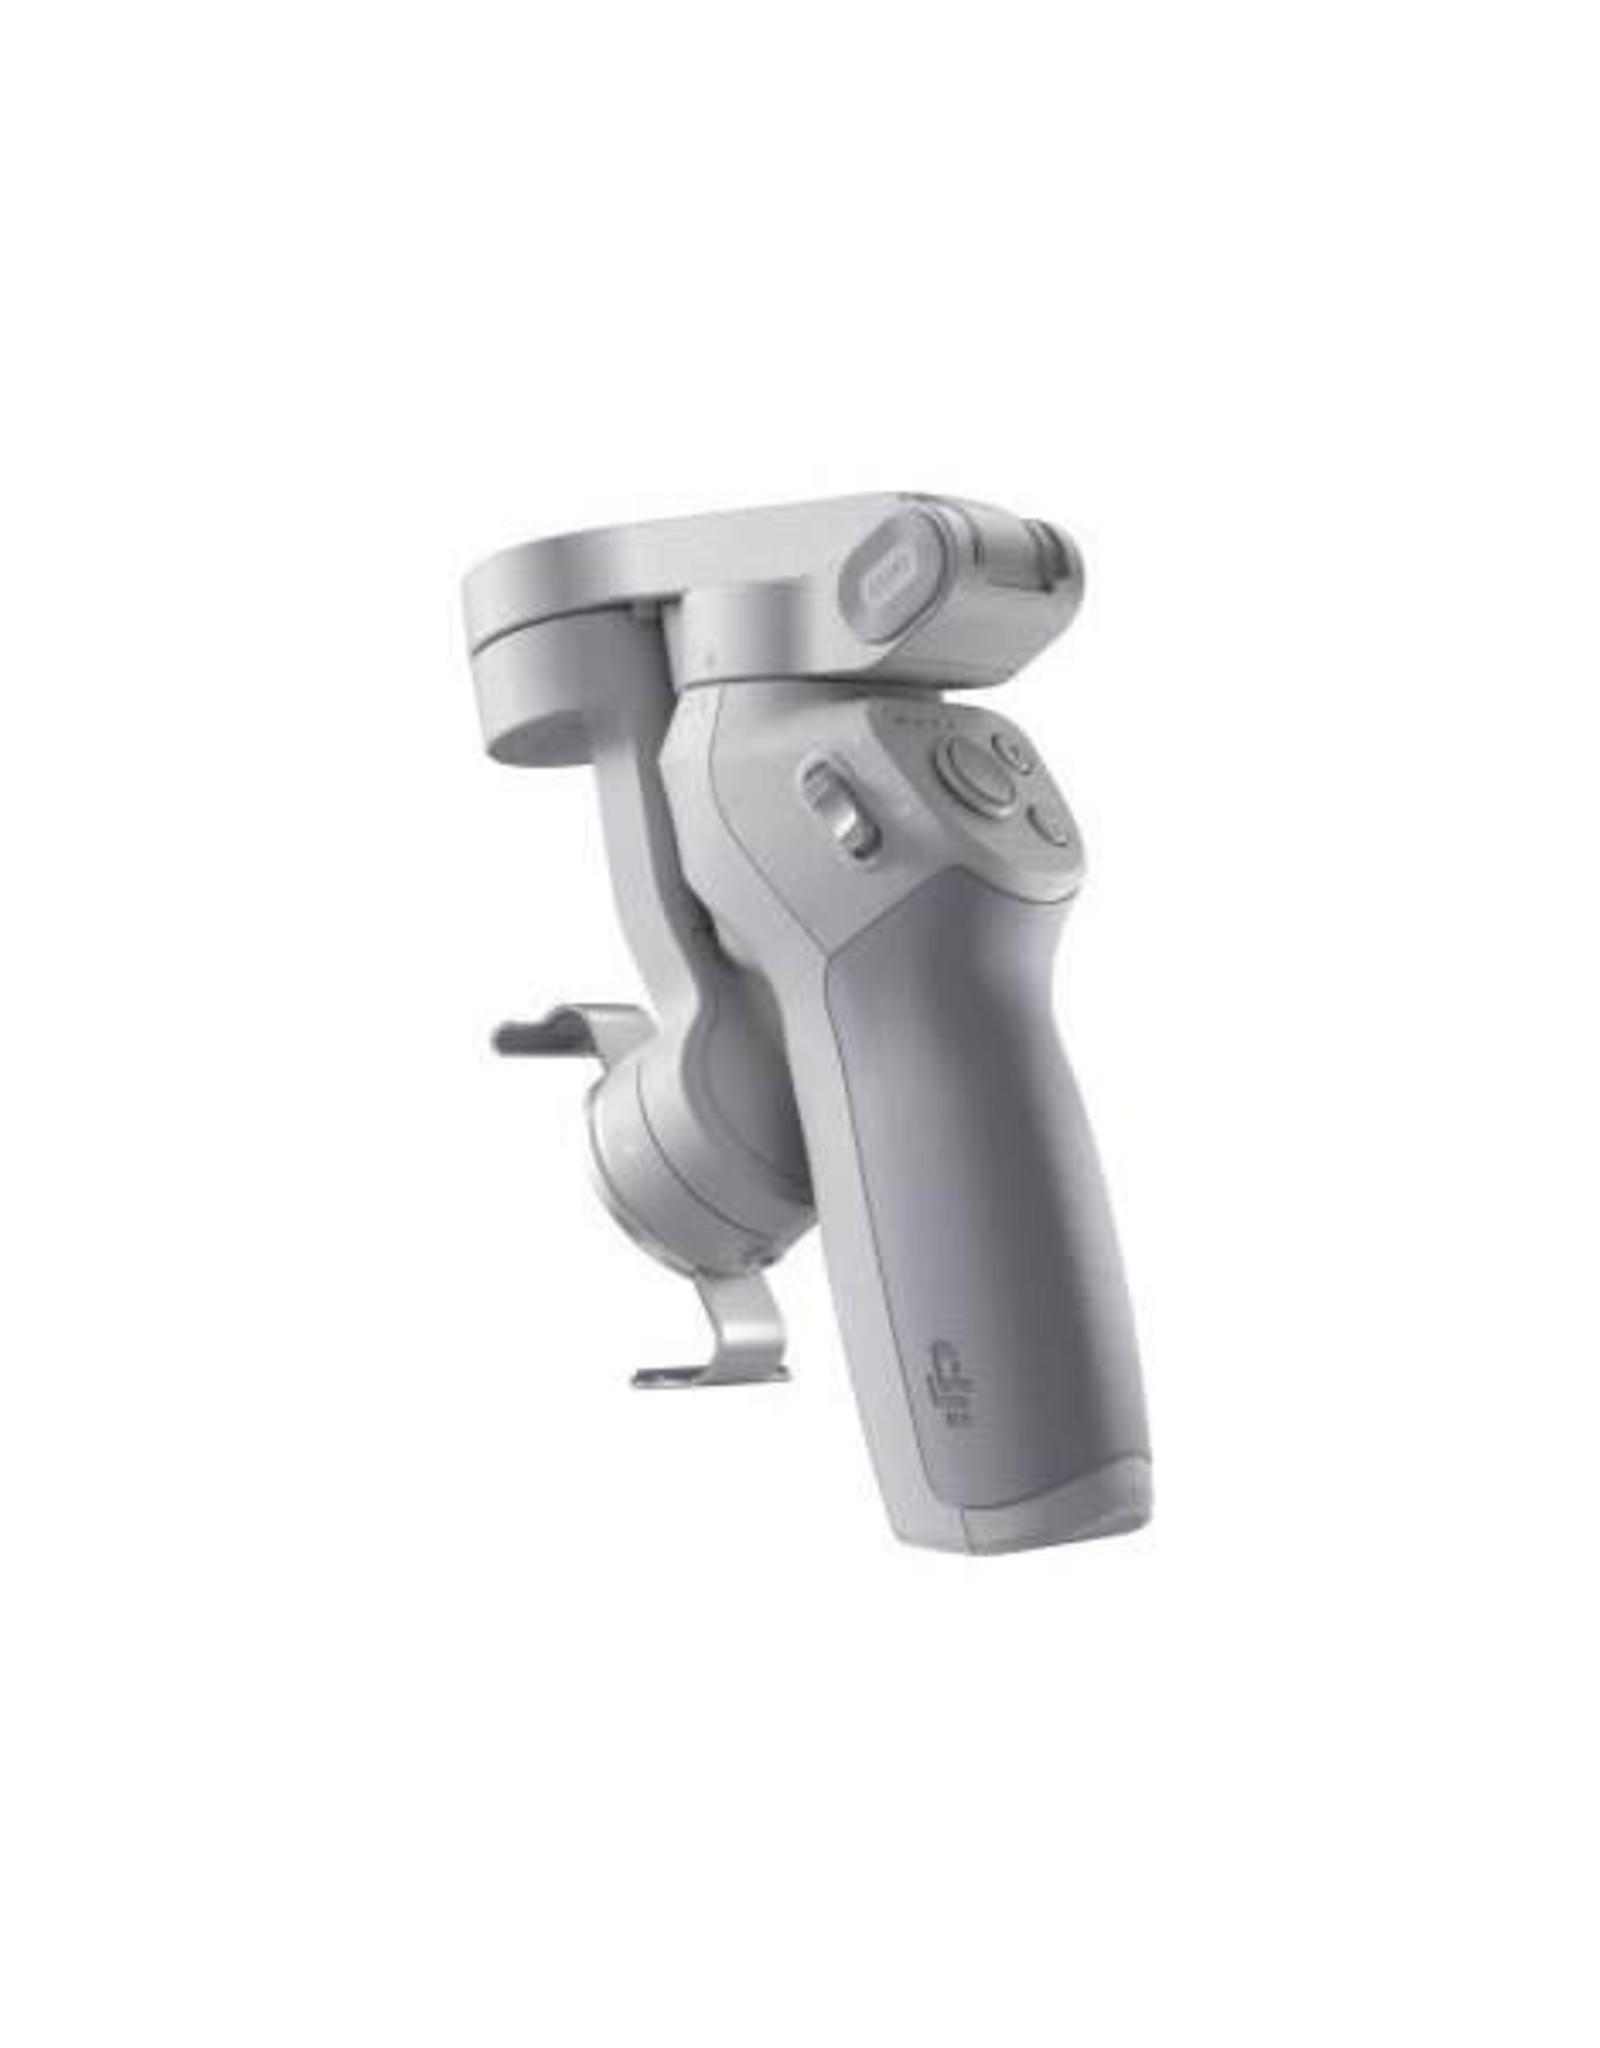 Dji DJI Osmo Mobile 4 OM 4 Smart Stabilizer